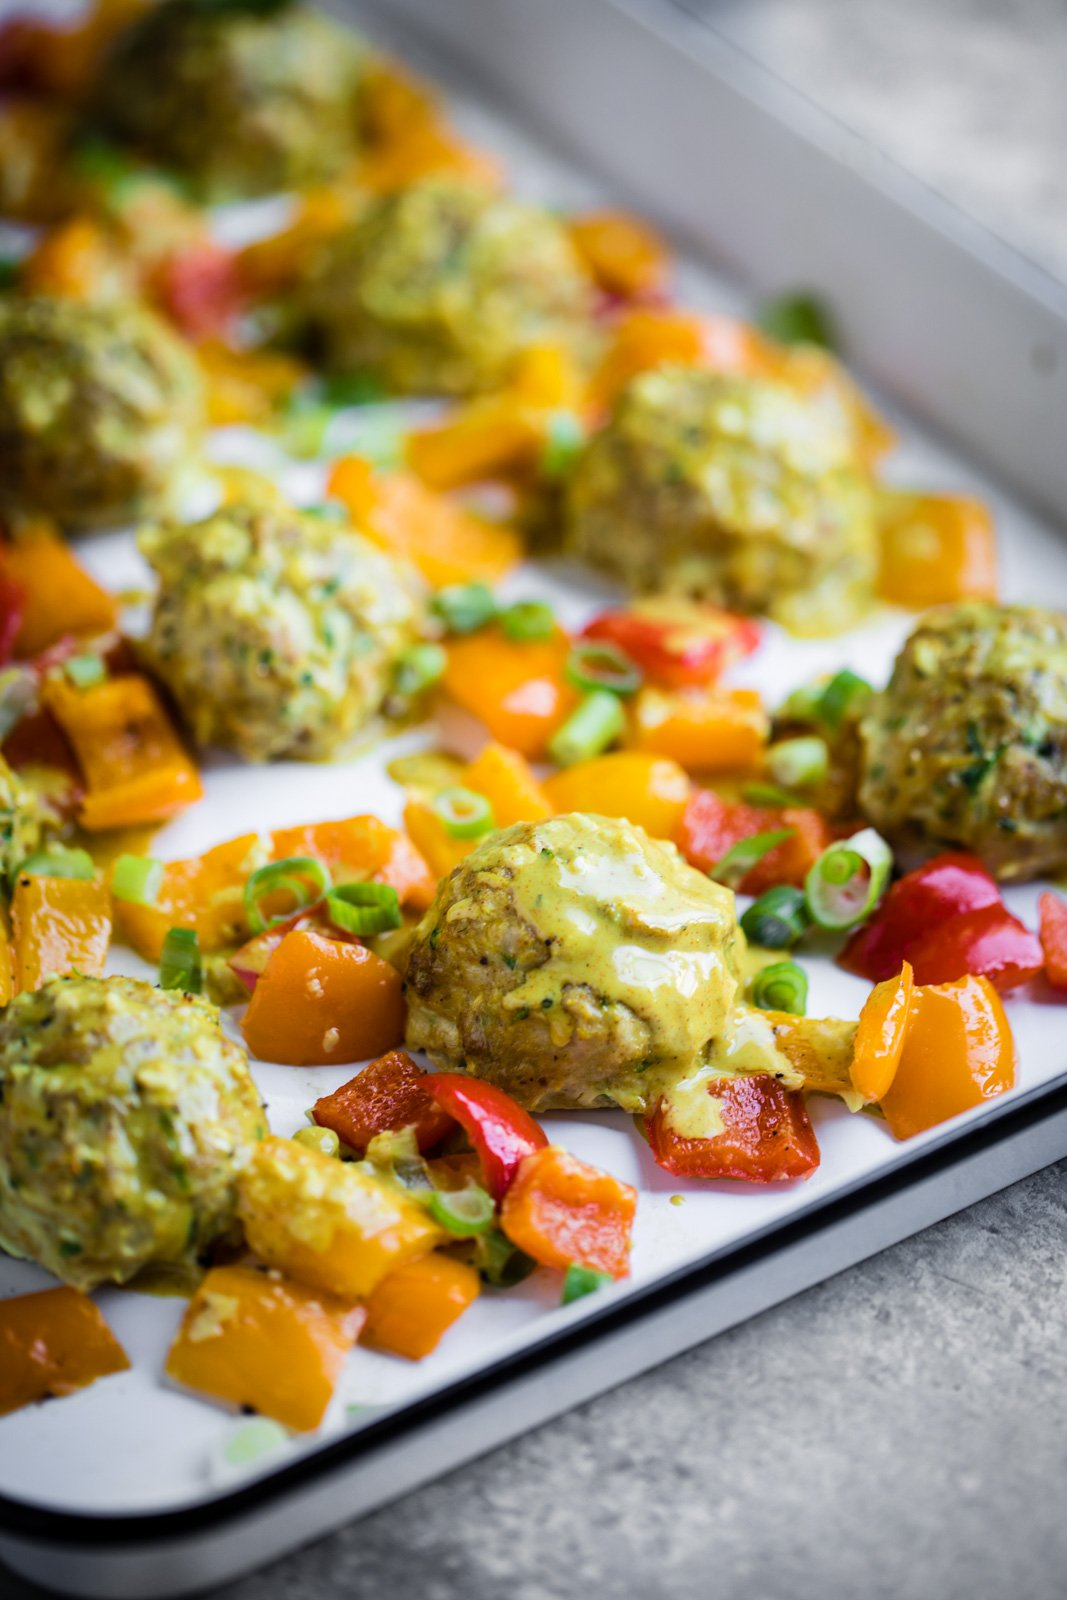 top 25 favorite recipes: zucchini chicken meatballs on a sheet pan